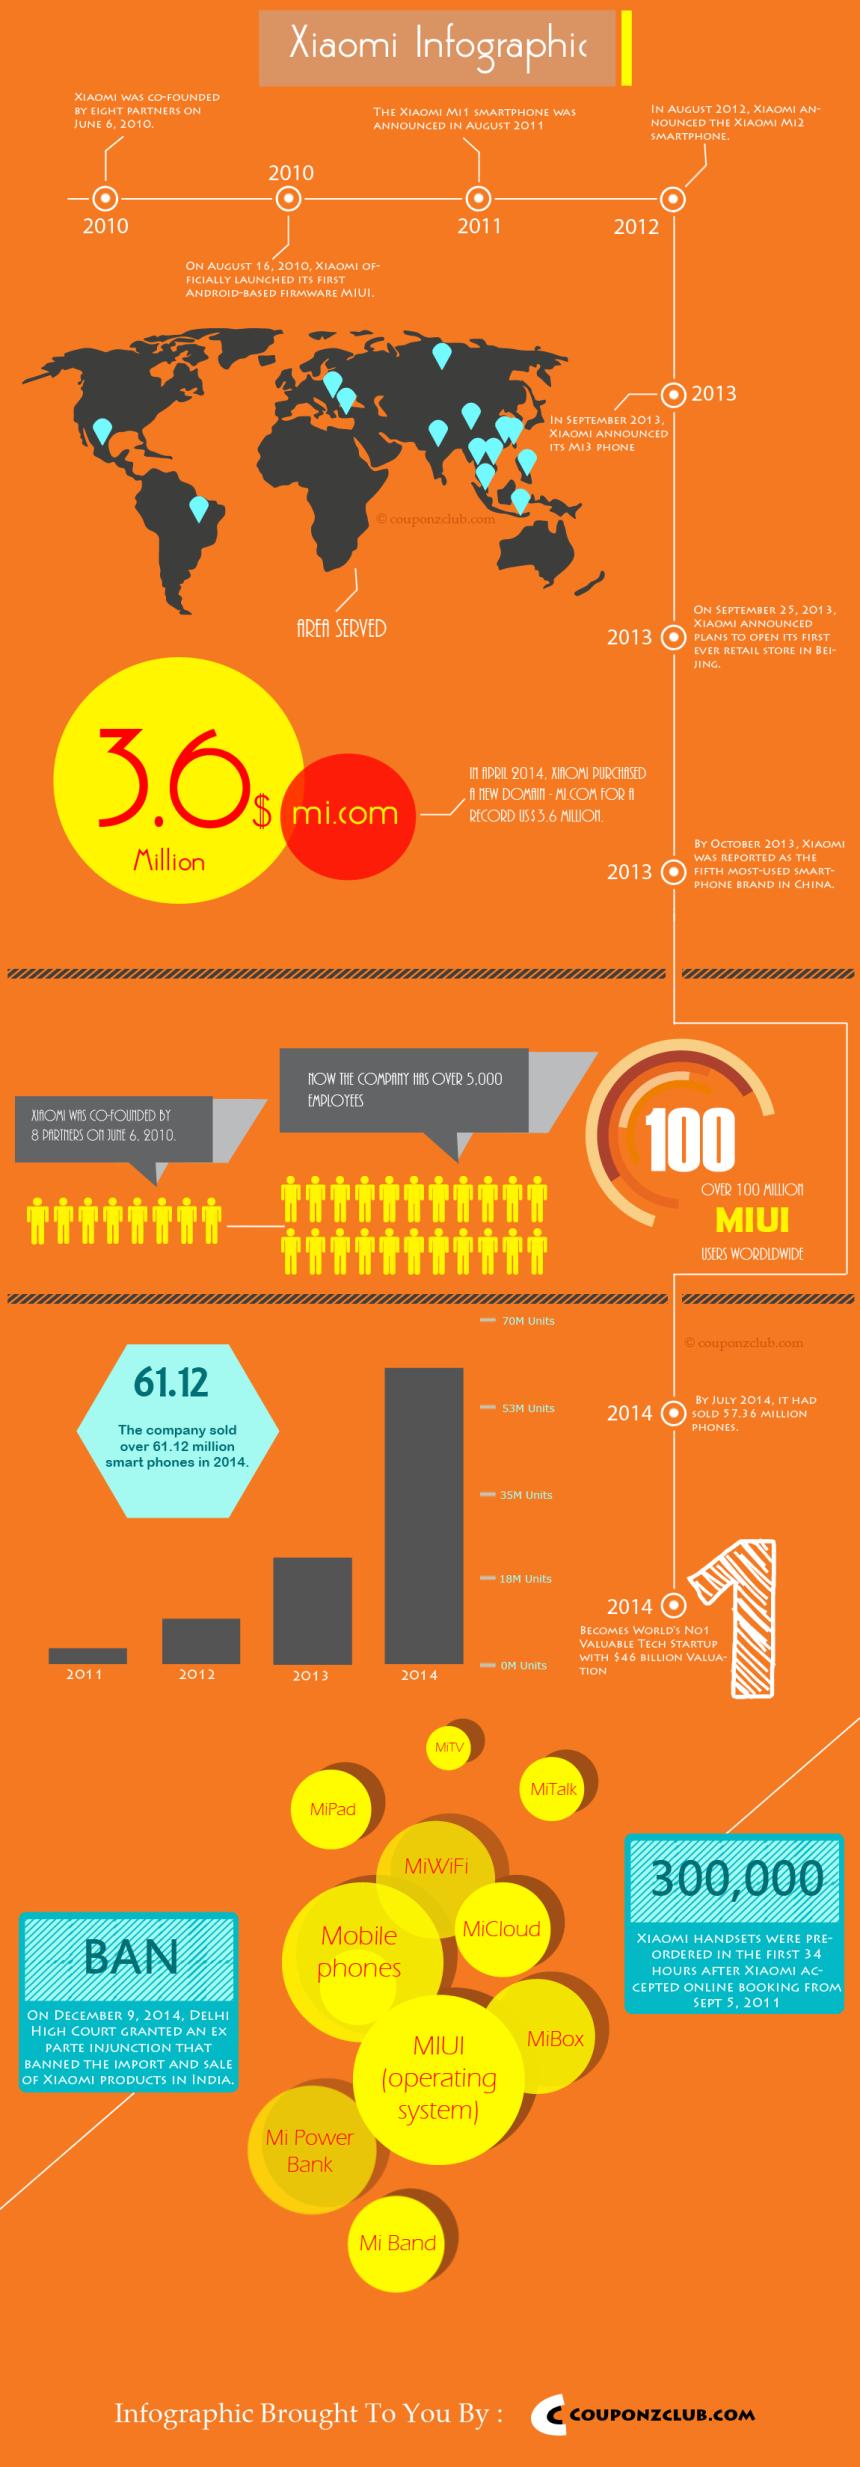 Xioami: Timeline de un éxito fulgurante